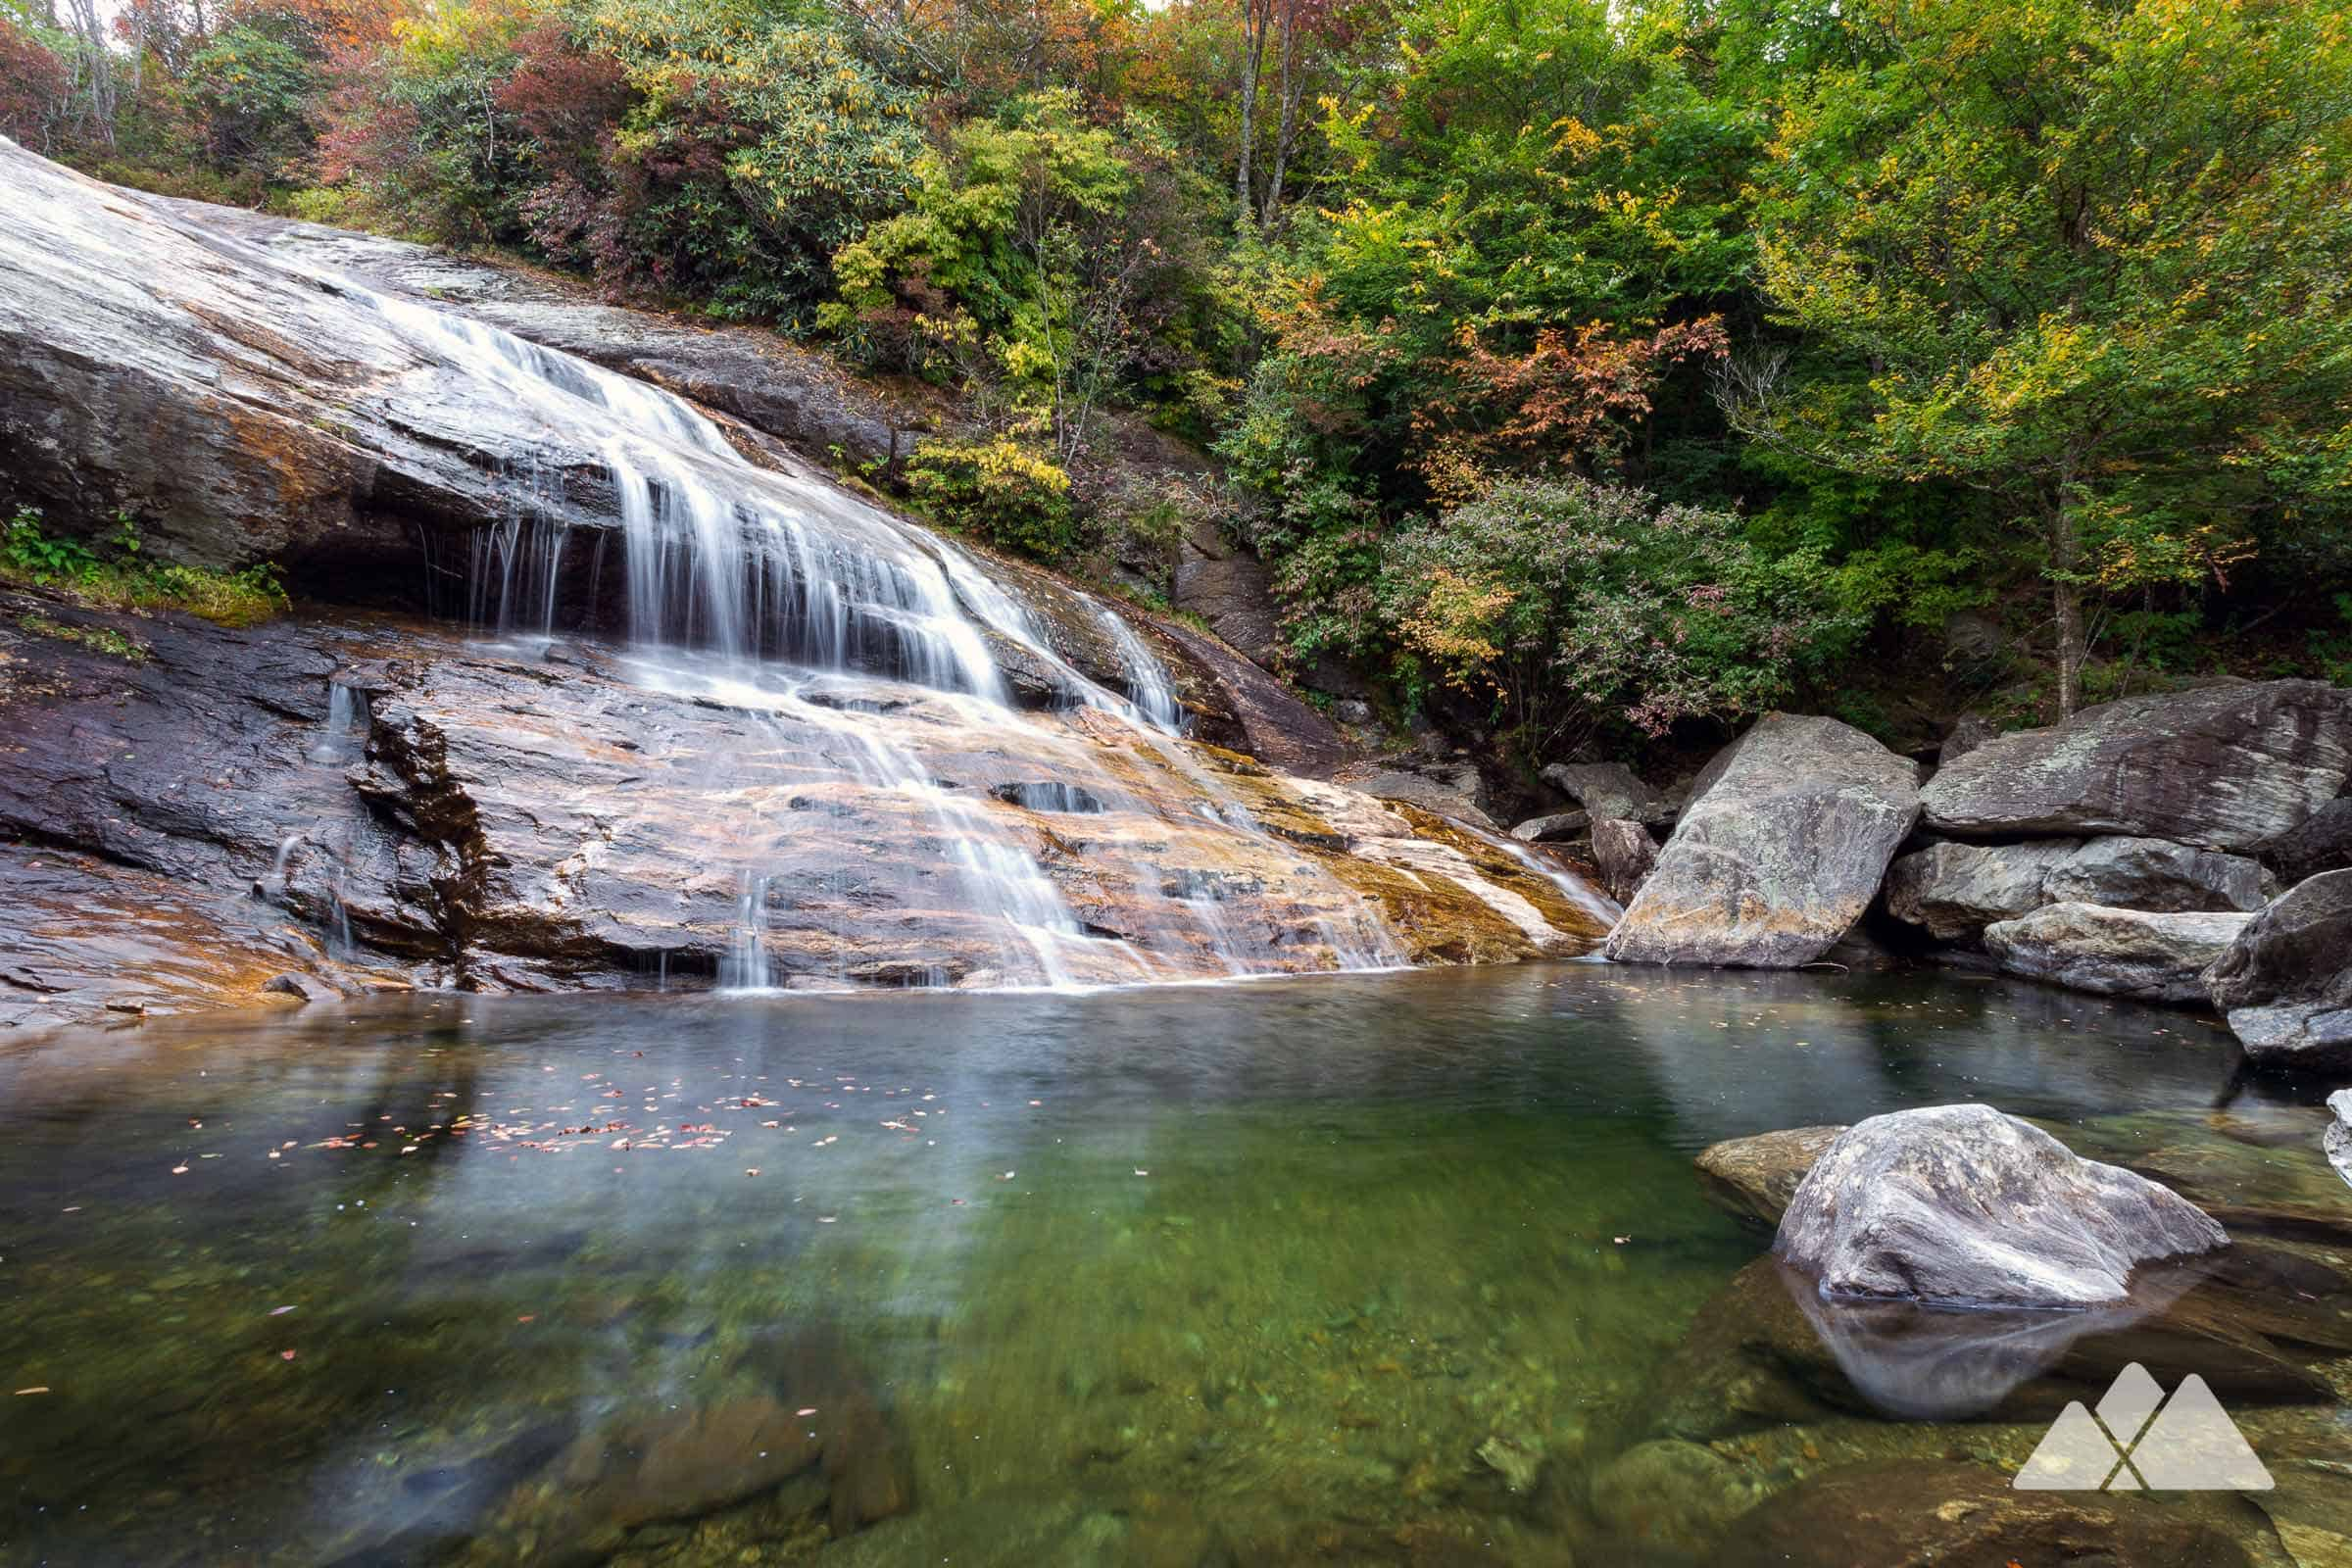 Dog Friendly Blue Ridge Mountain Hiking Trails North Carolina